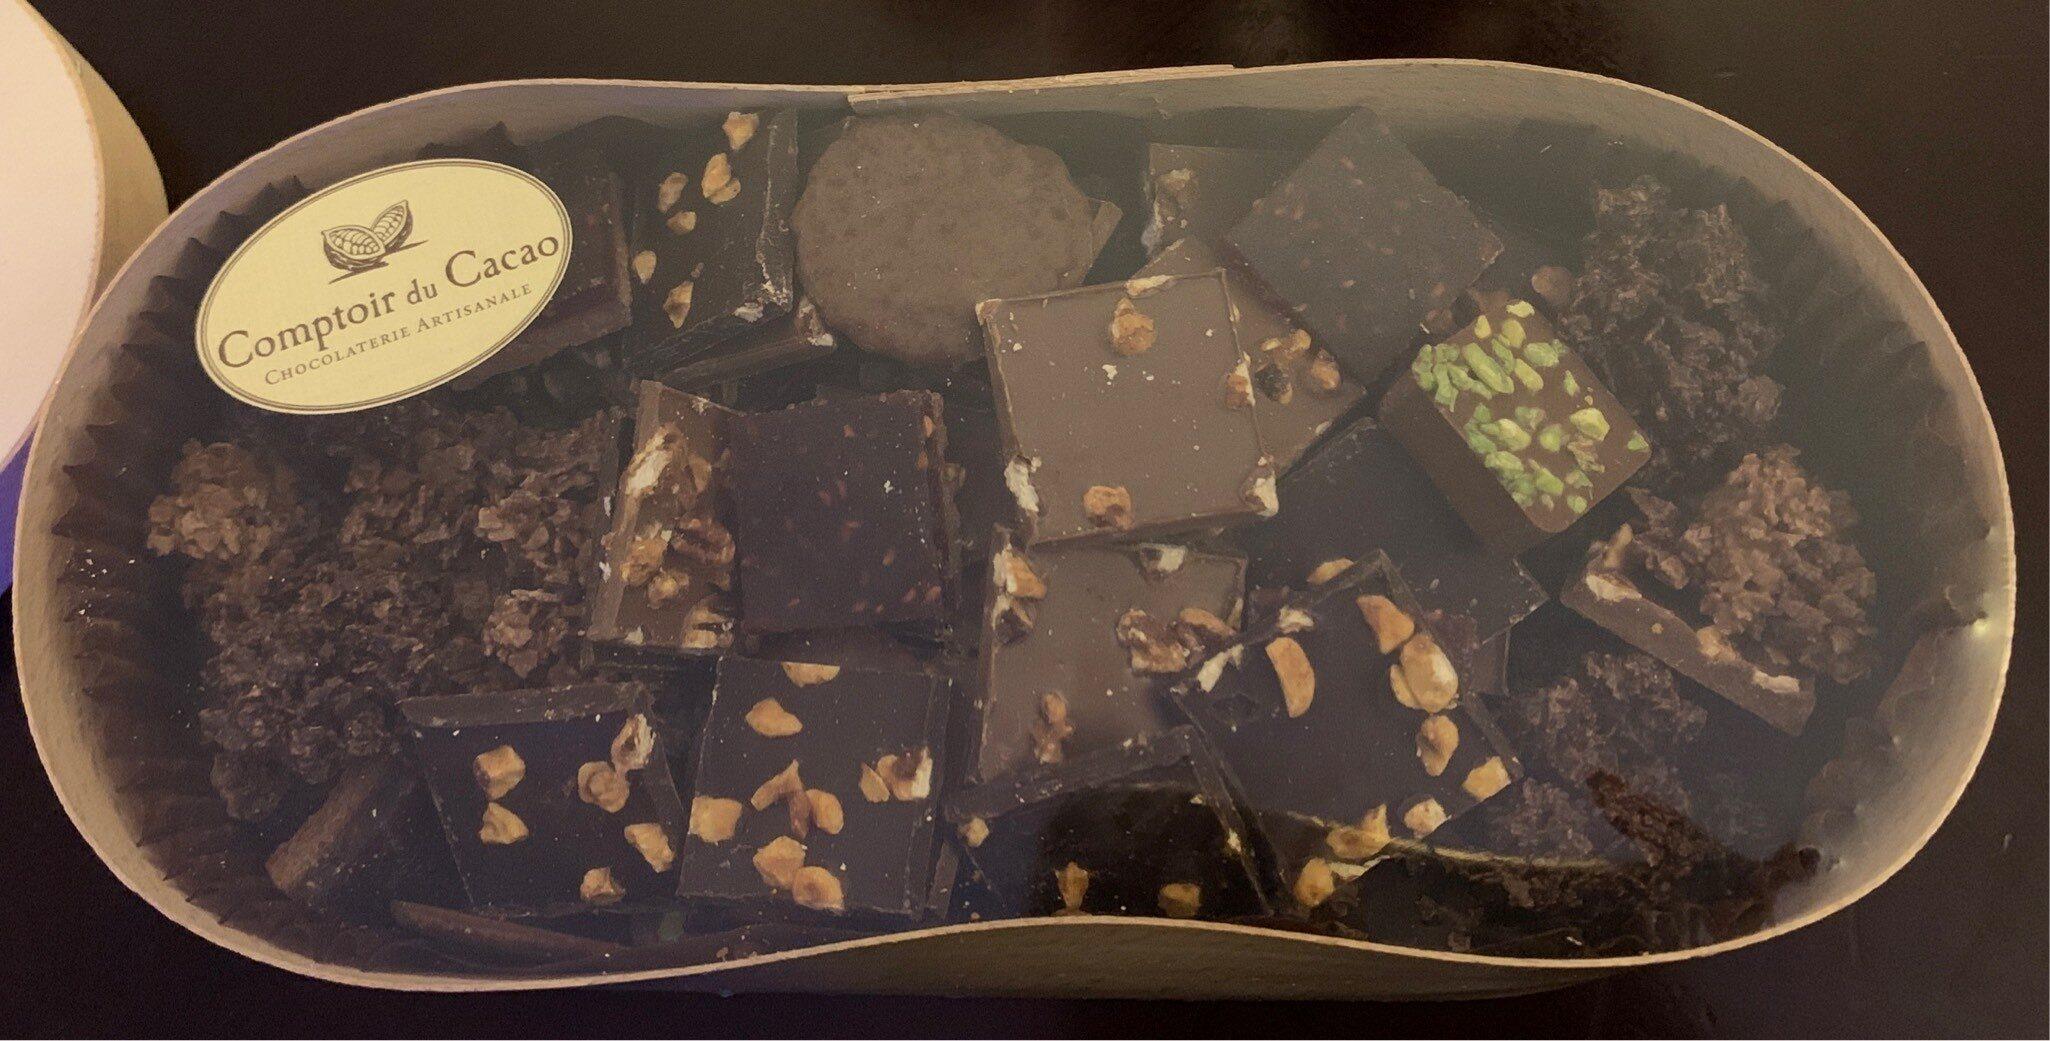 Assortiments chcocolats - Product